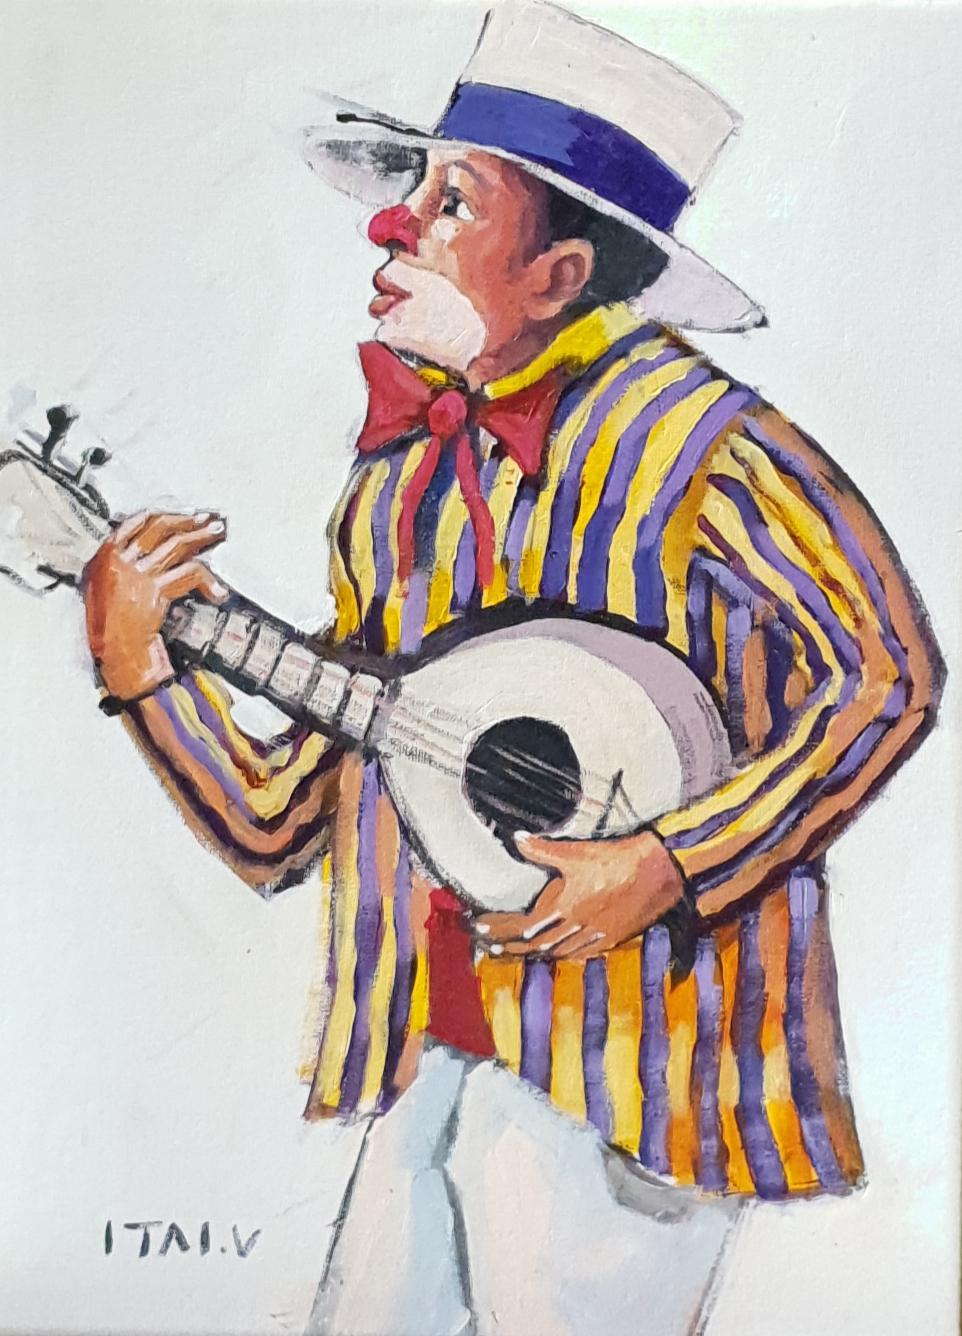 itai v clown 1